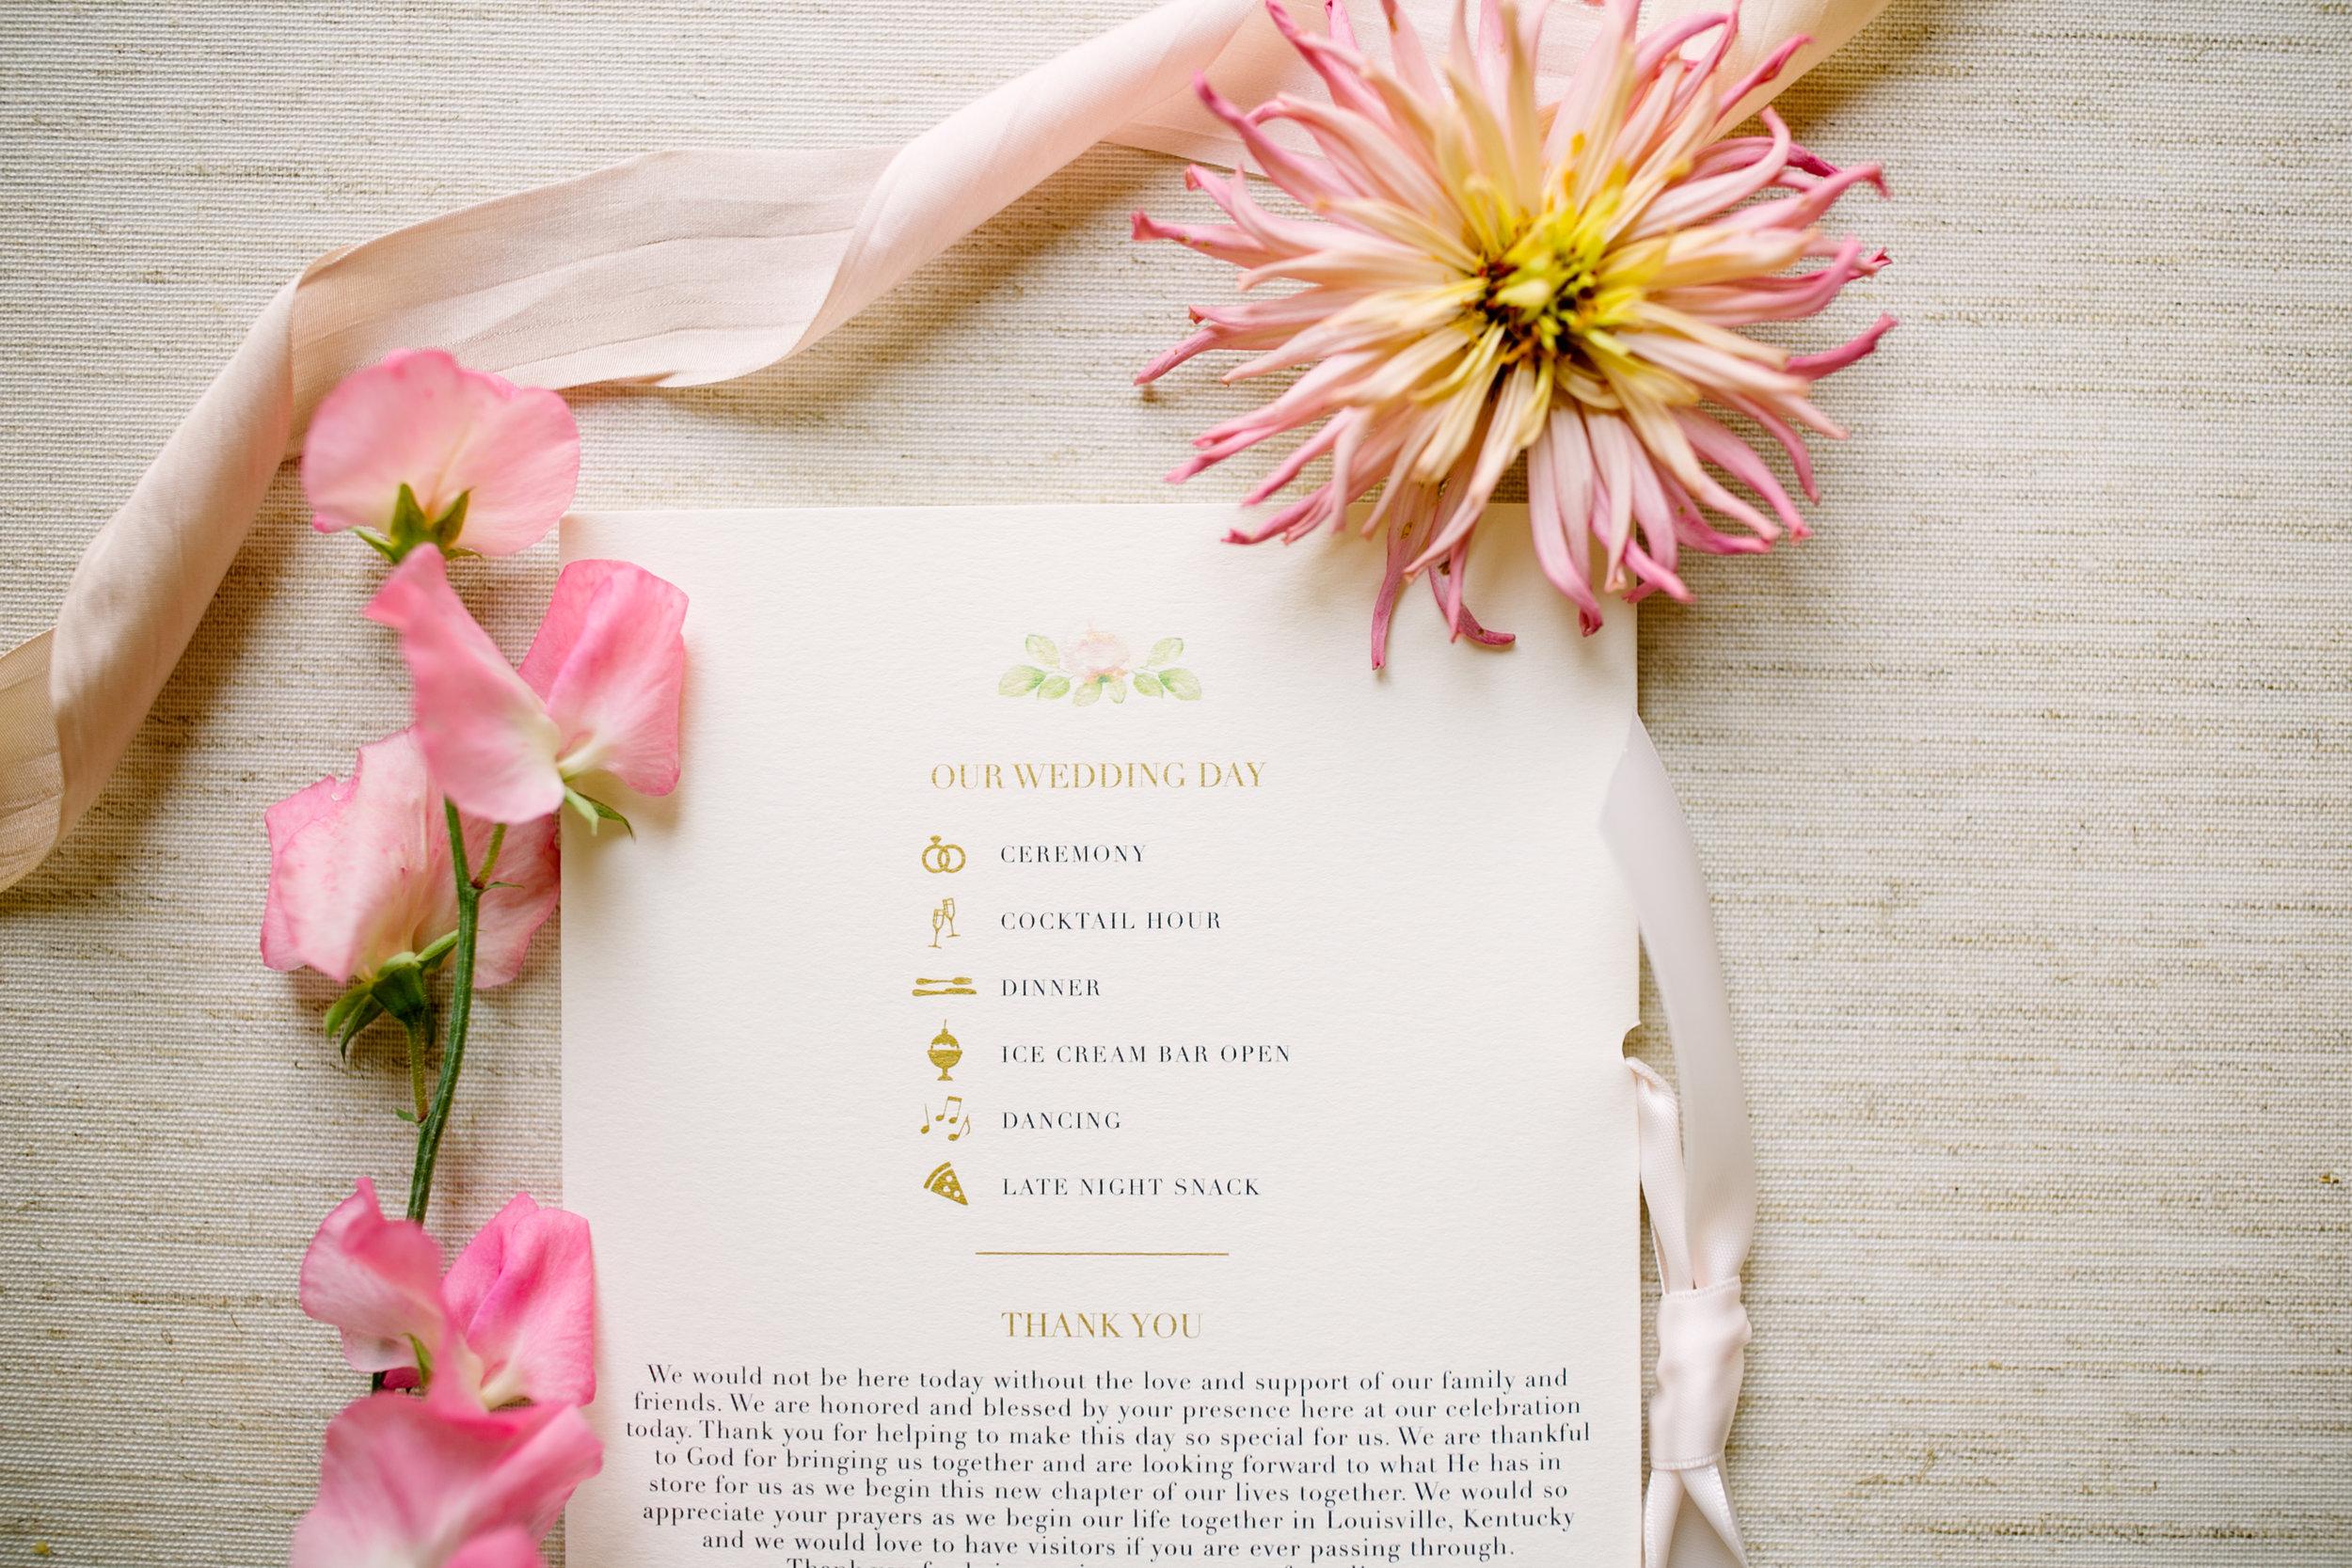 Wedding Timeline on Program